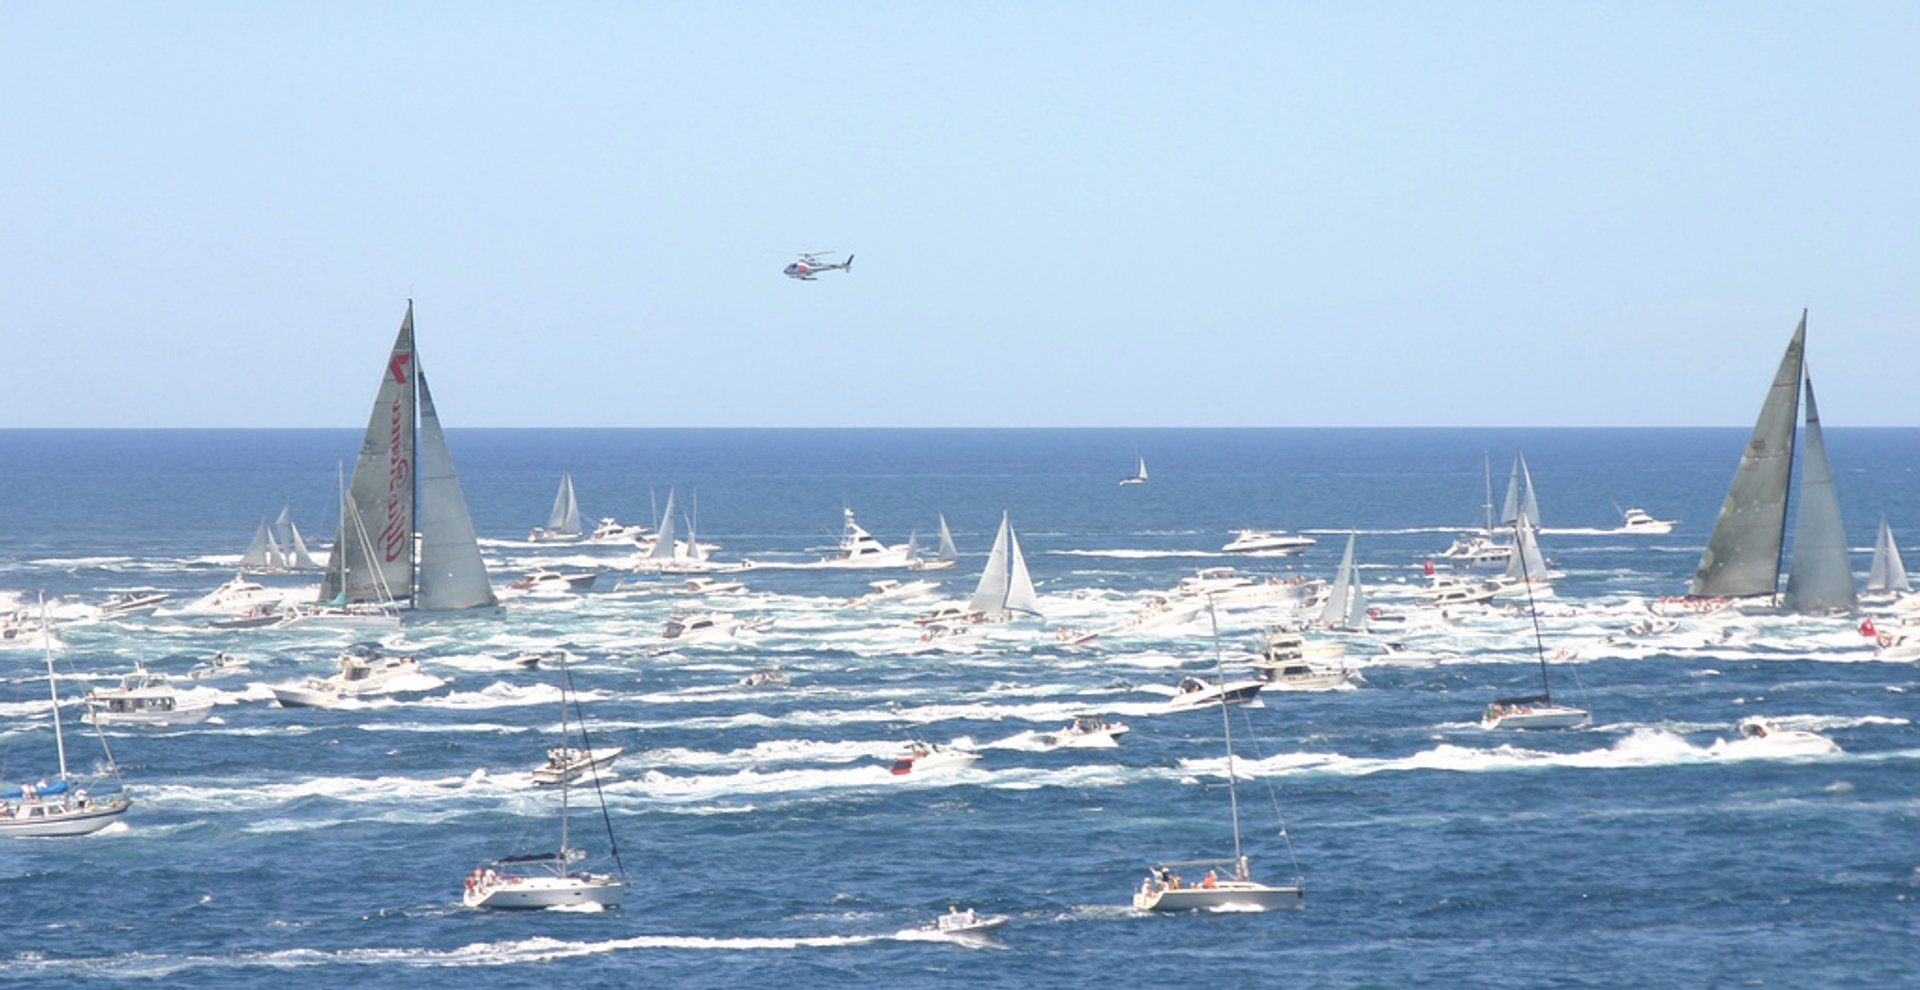 Sydney Hobart Yacht Race in Tasmania 2020 - Best Time